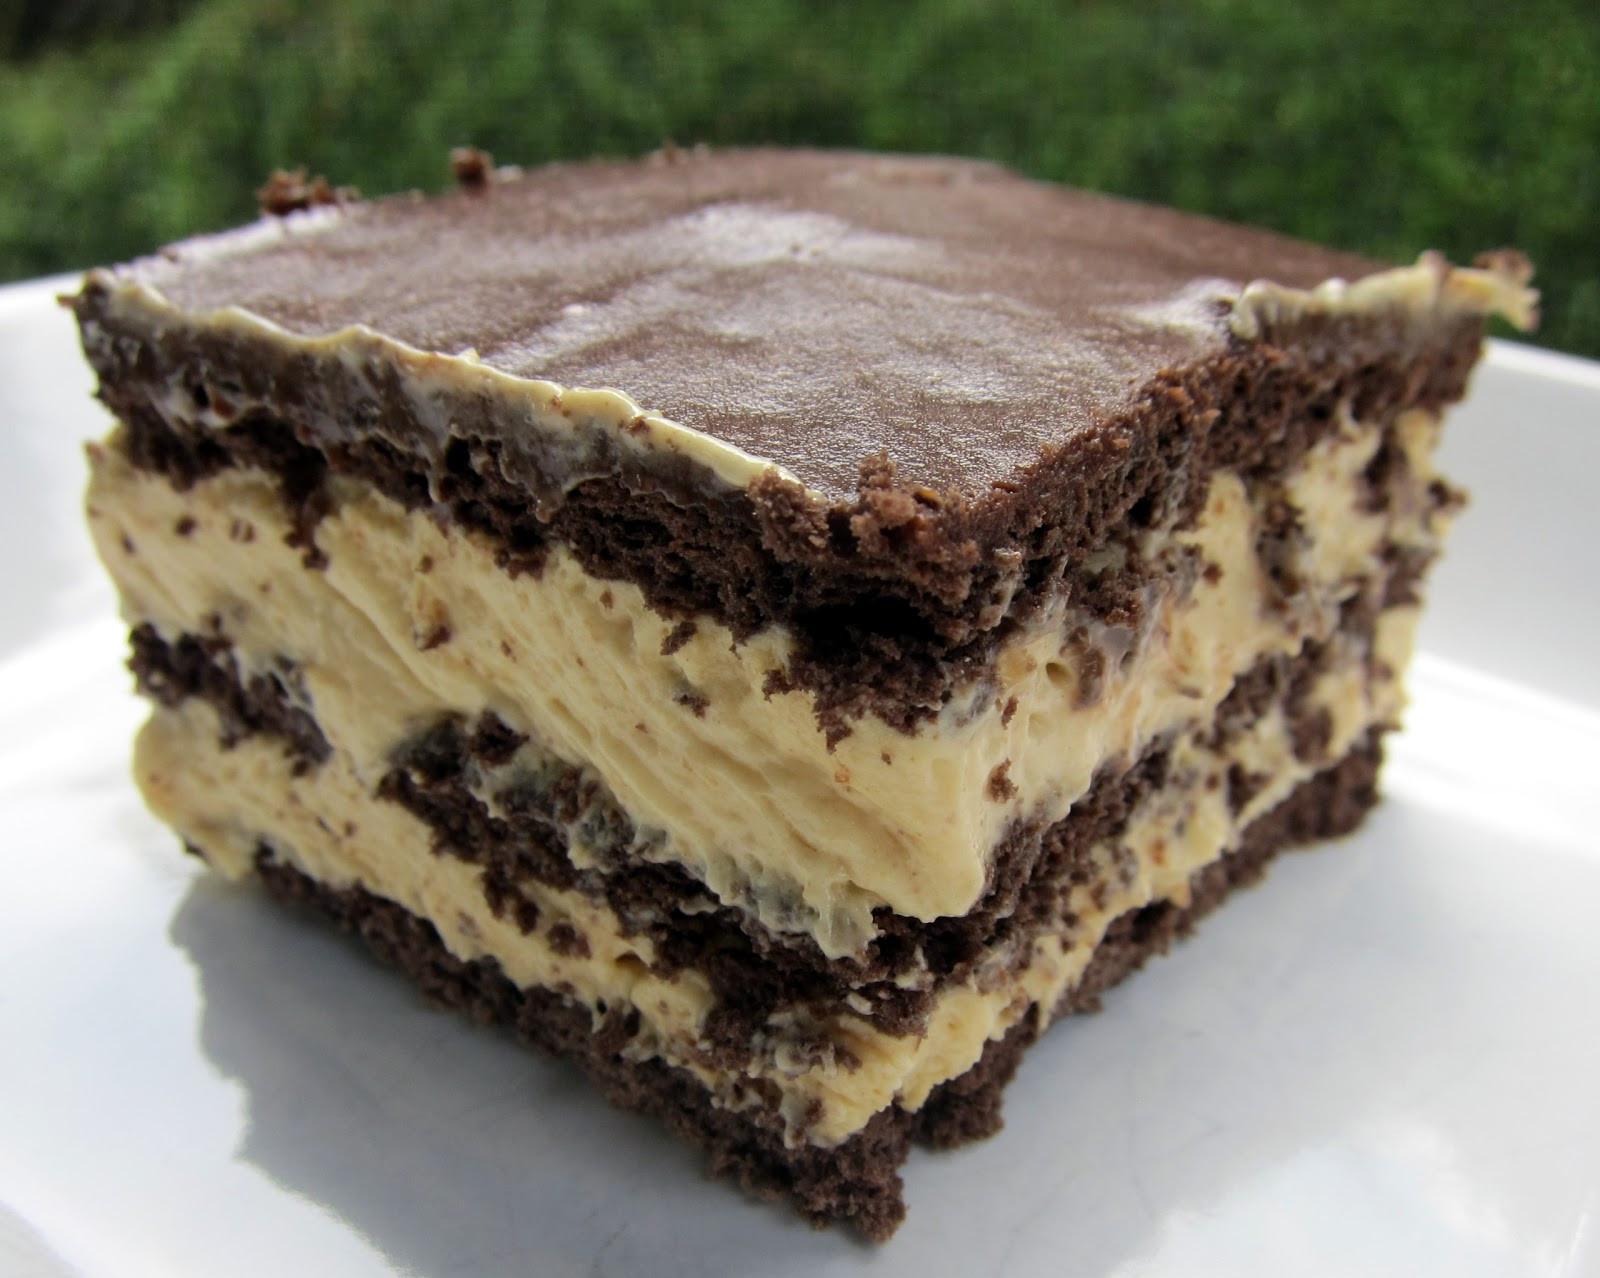 Chocolate Peanut Butter Dessert Recipe  Peanut Butter Eclair Cake